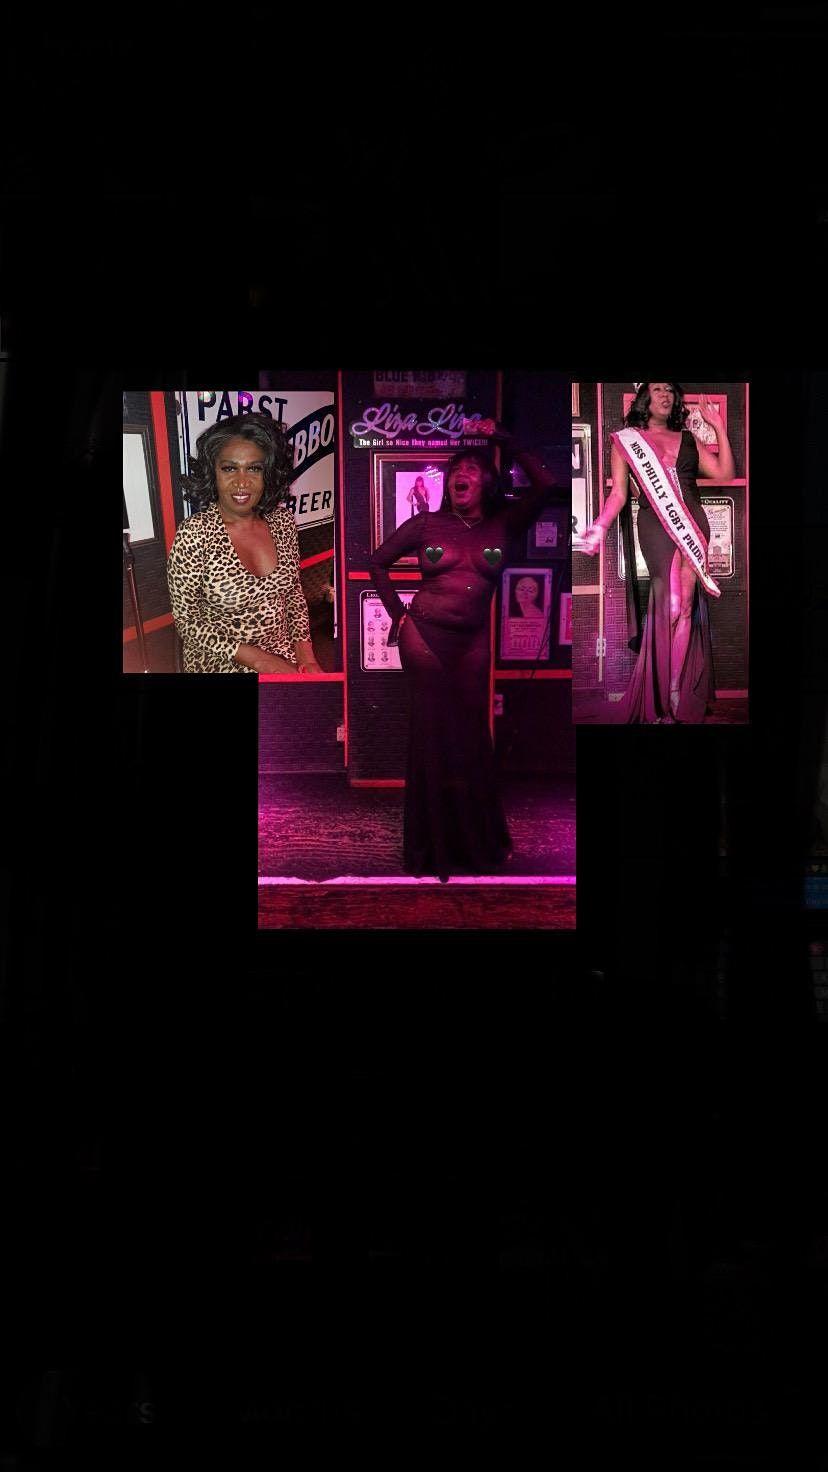 Miss Lisa Lisa's Drag Show